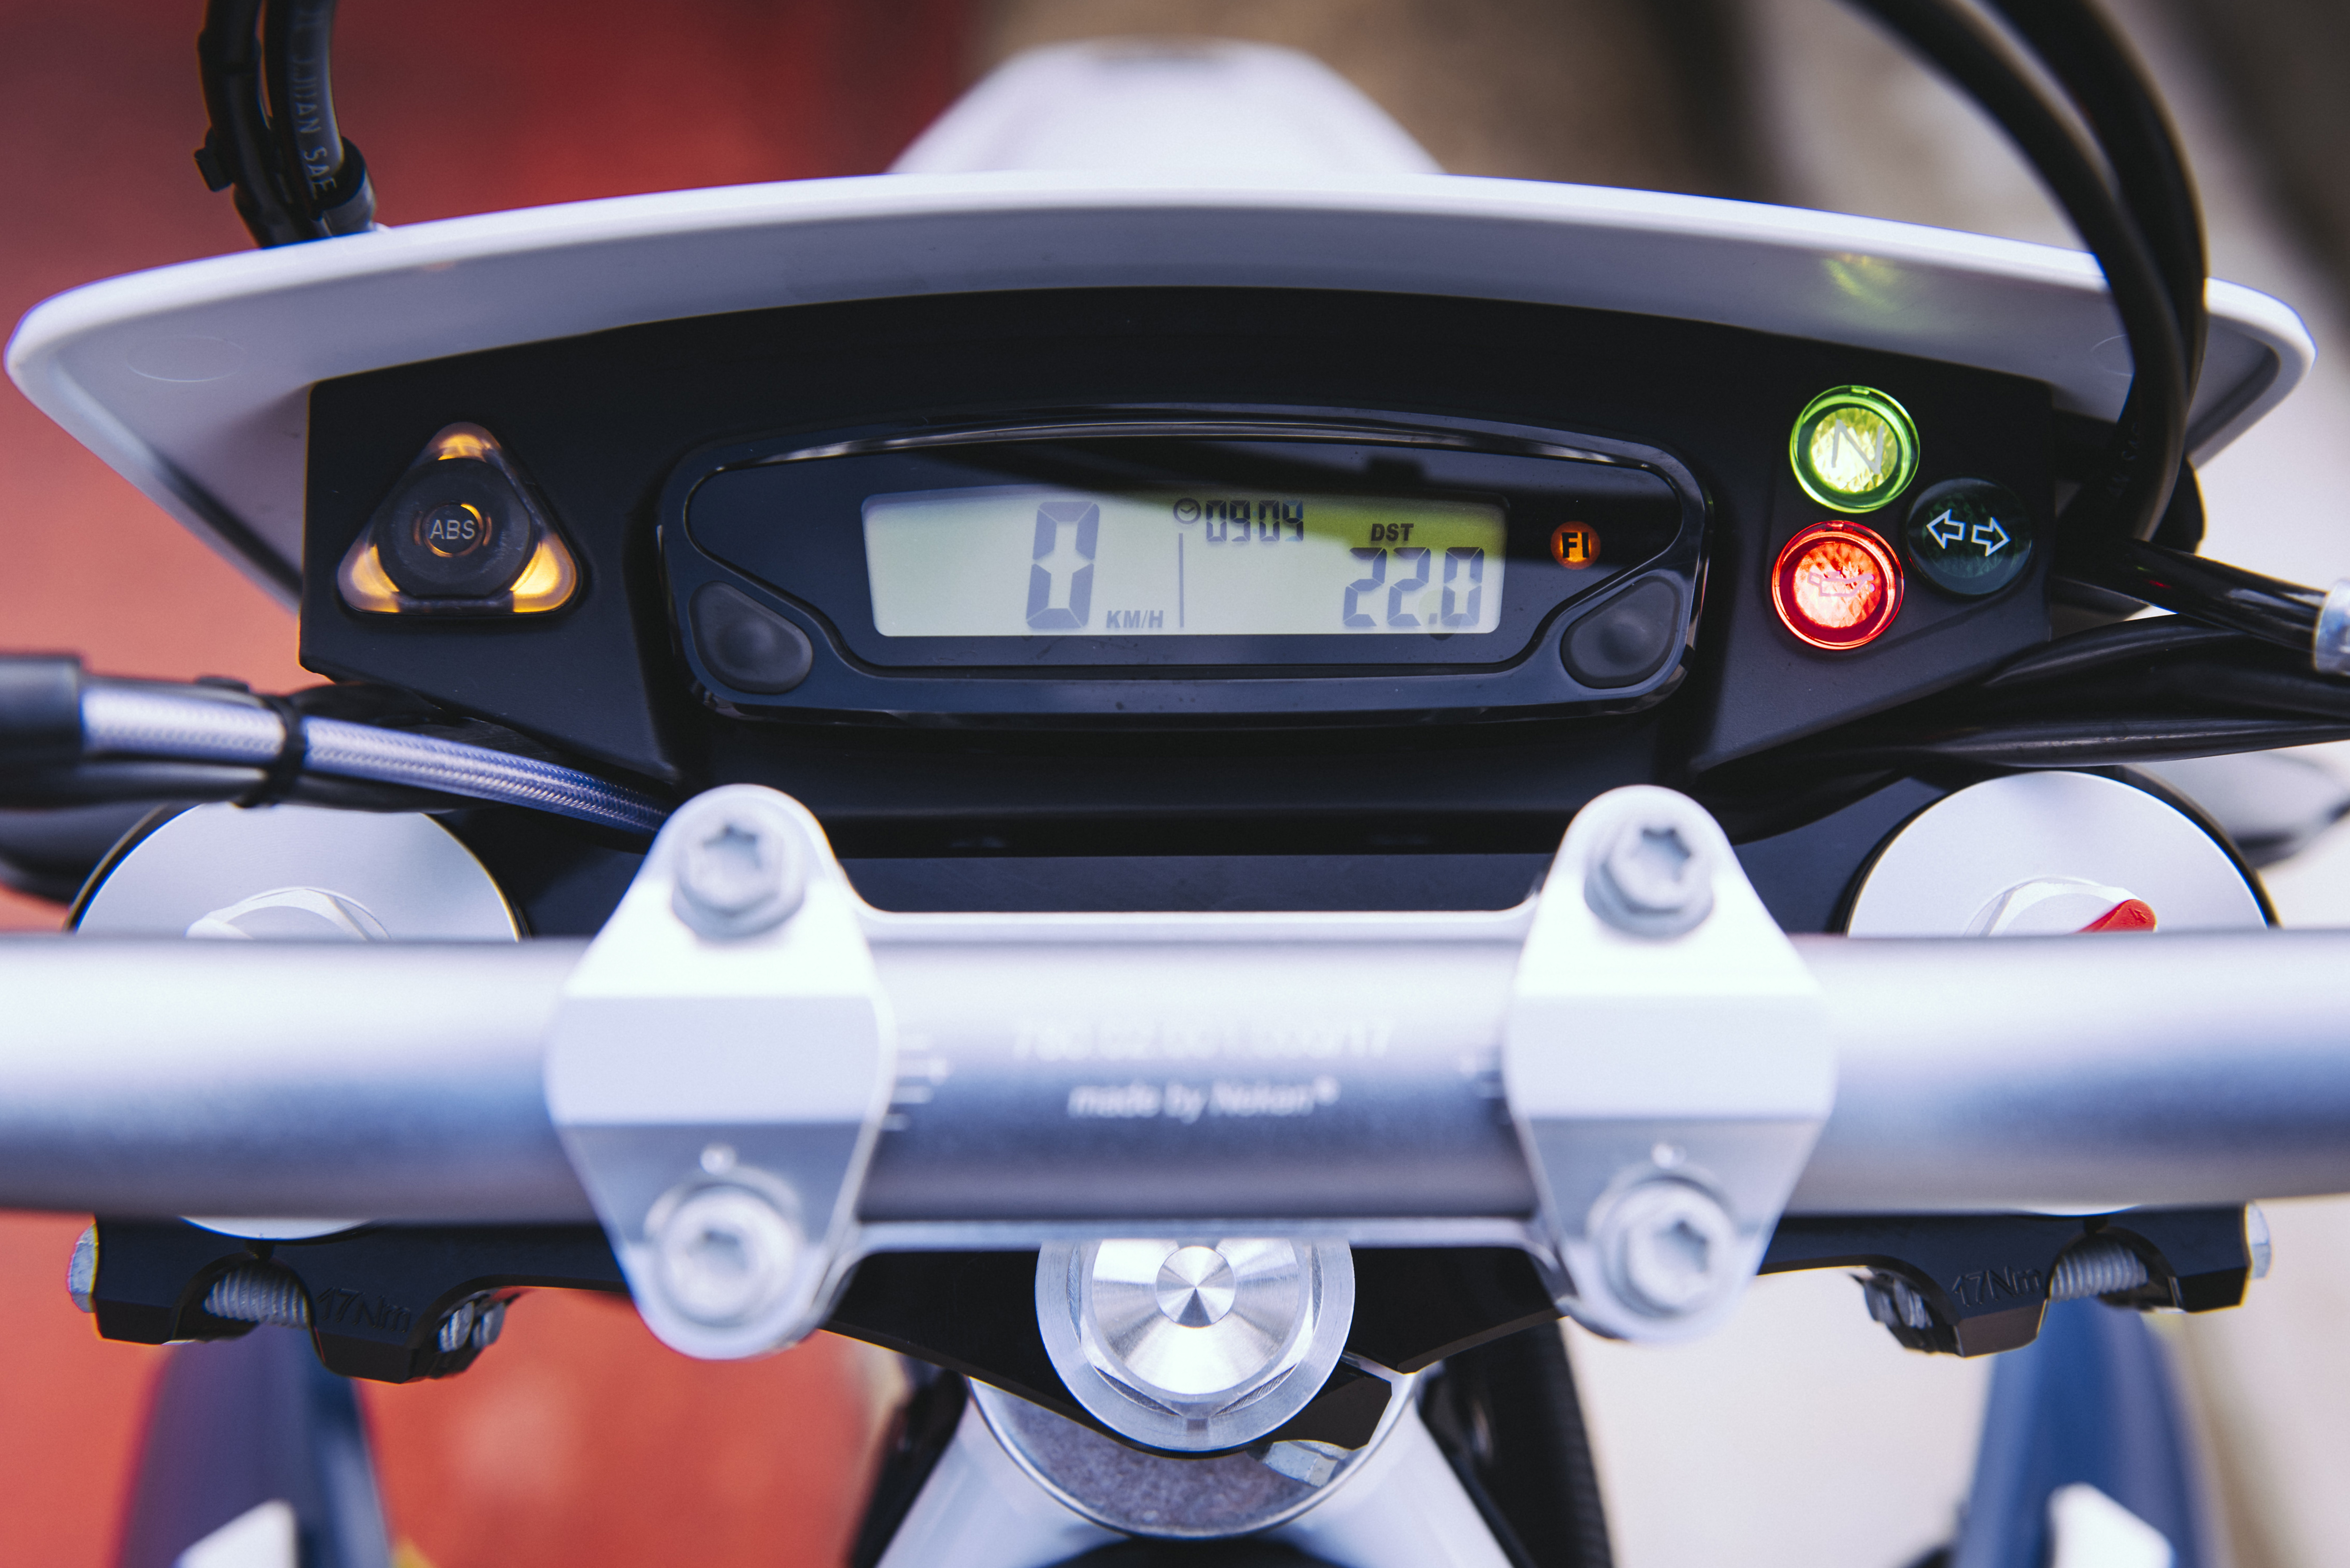 First ride: Husqvarna 701 Supermoto review